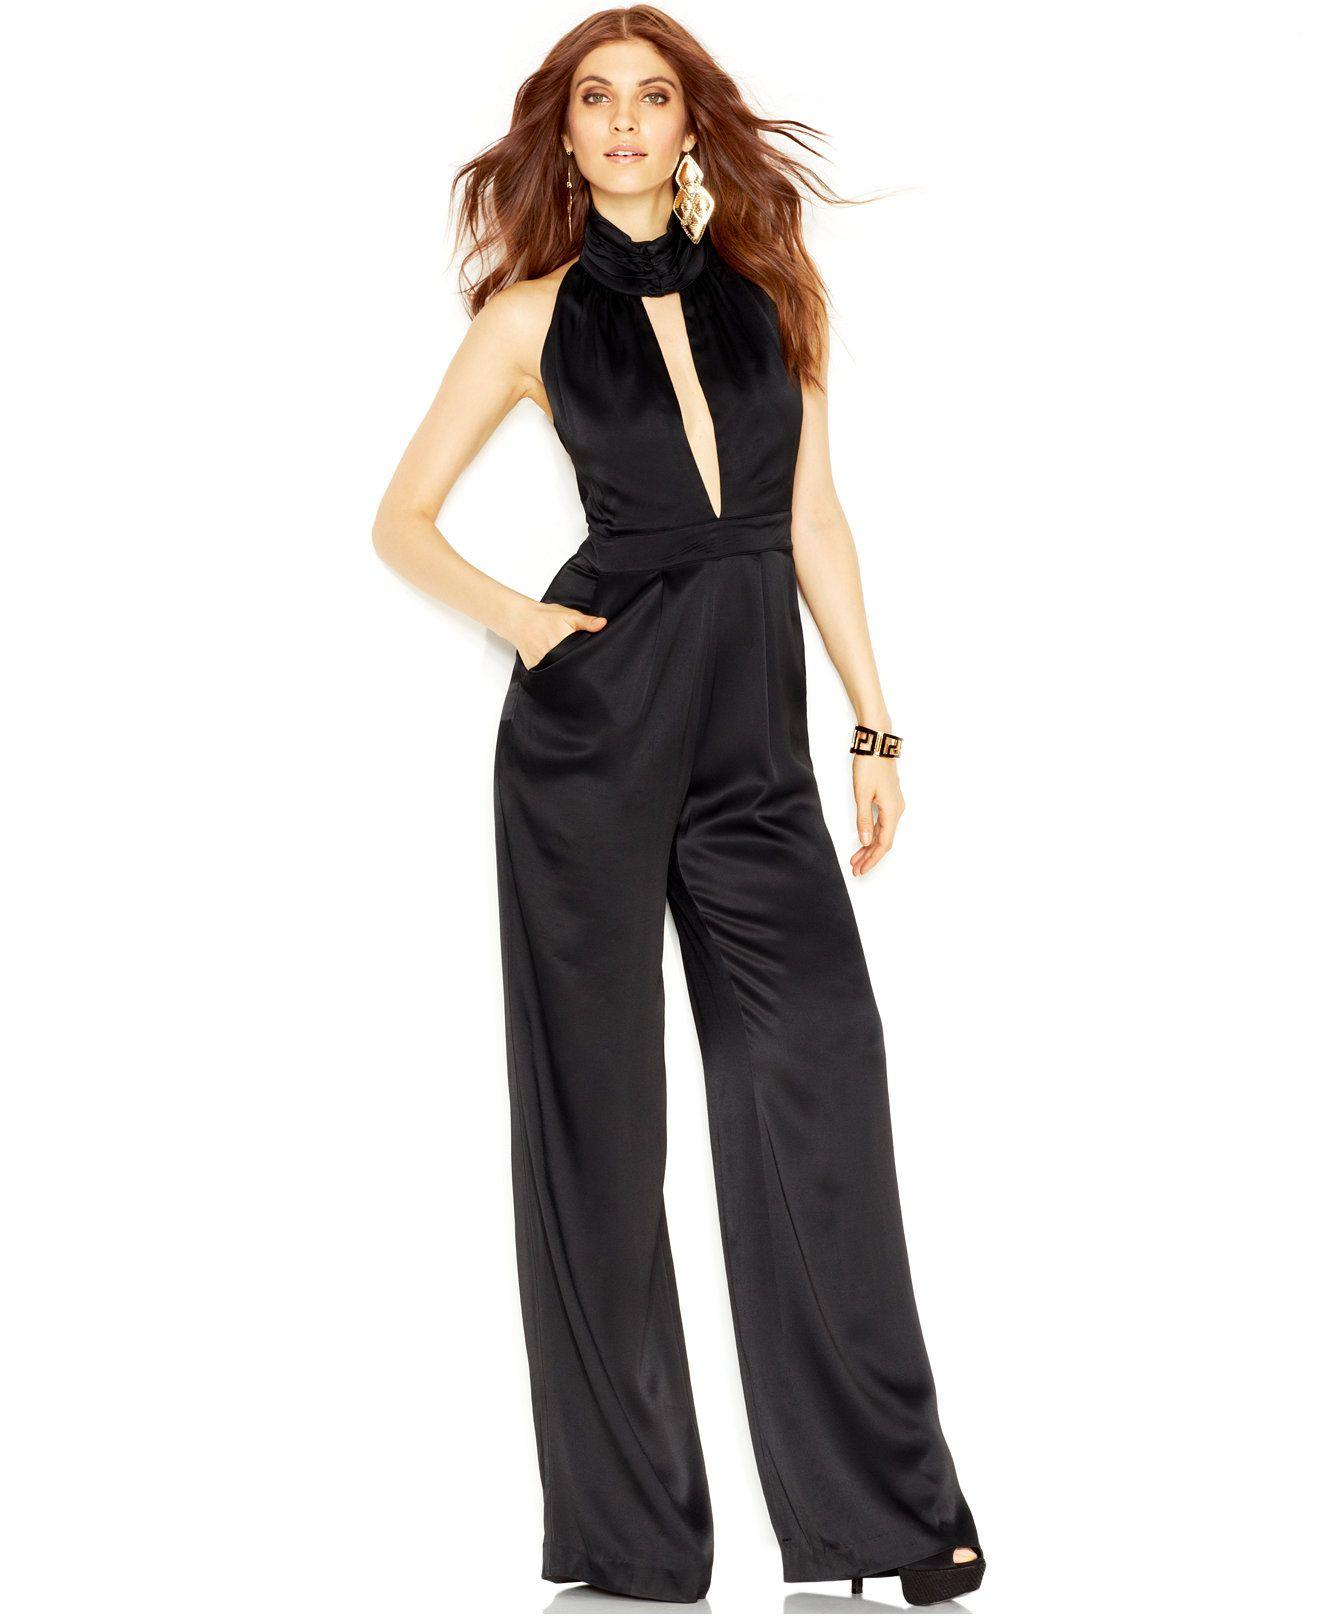 fbf0c1f2809c GUESS Sleeveless Halter-Neck Jumpsuit - Pants - Women - Macy s